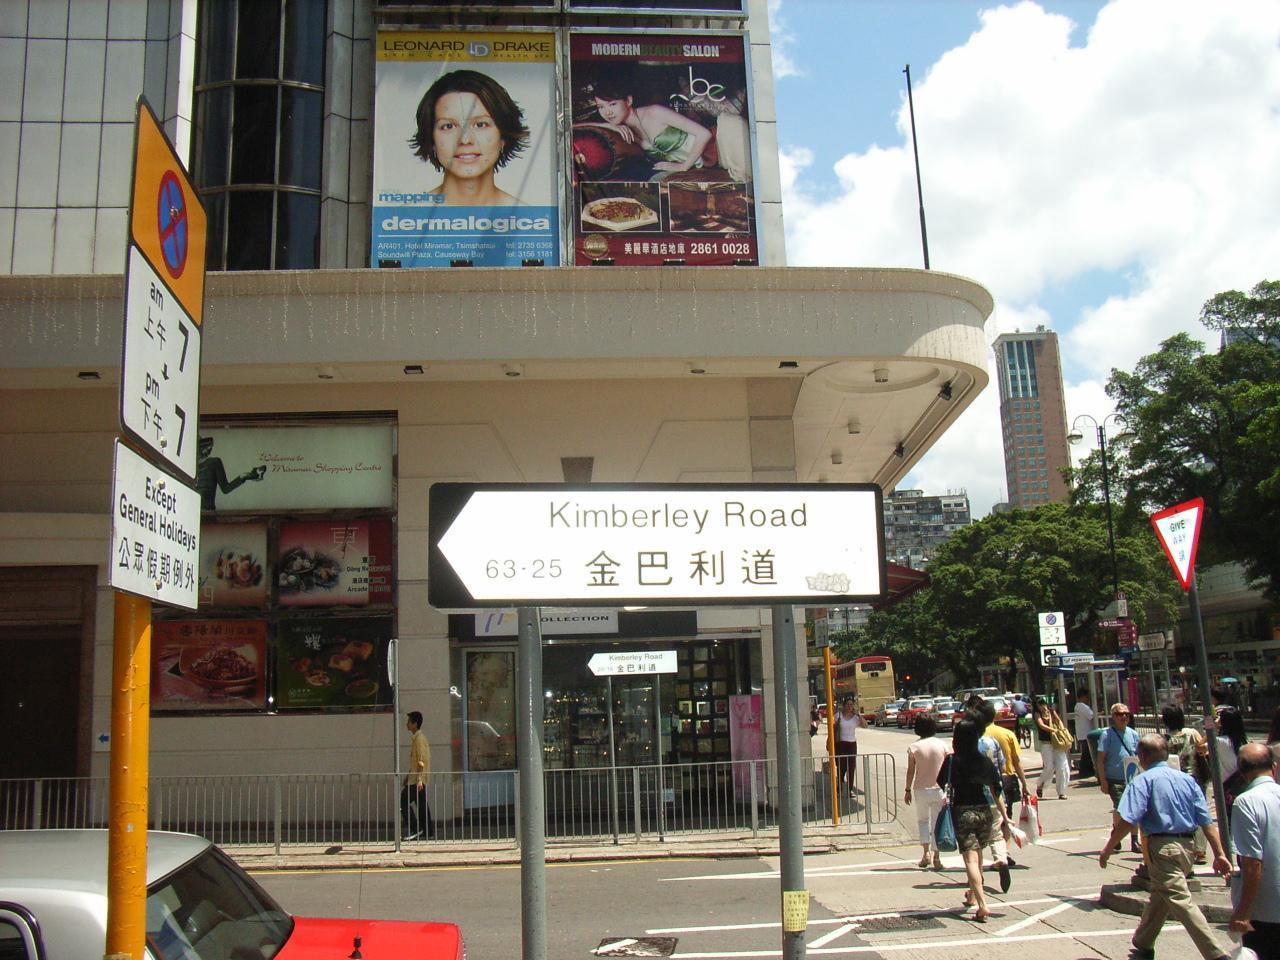 File:HK TST Kimberley Road Nathan Road.jpg - Wikimedia Commons on christchurch new zealand map, wong tai sin map, new territories map, kai tak airport map, causeway bay map, wan chai map, hong kong map, tsim tsa tsui map, china map, tsim sha tsui map, south korea map, london map, the gateway map, hk map, india map, toronto map, tuen mun map, macau map, tsuen wan map,